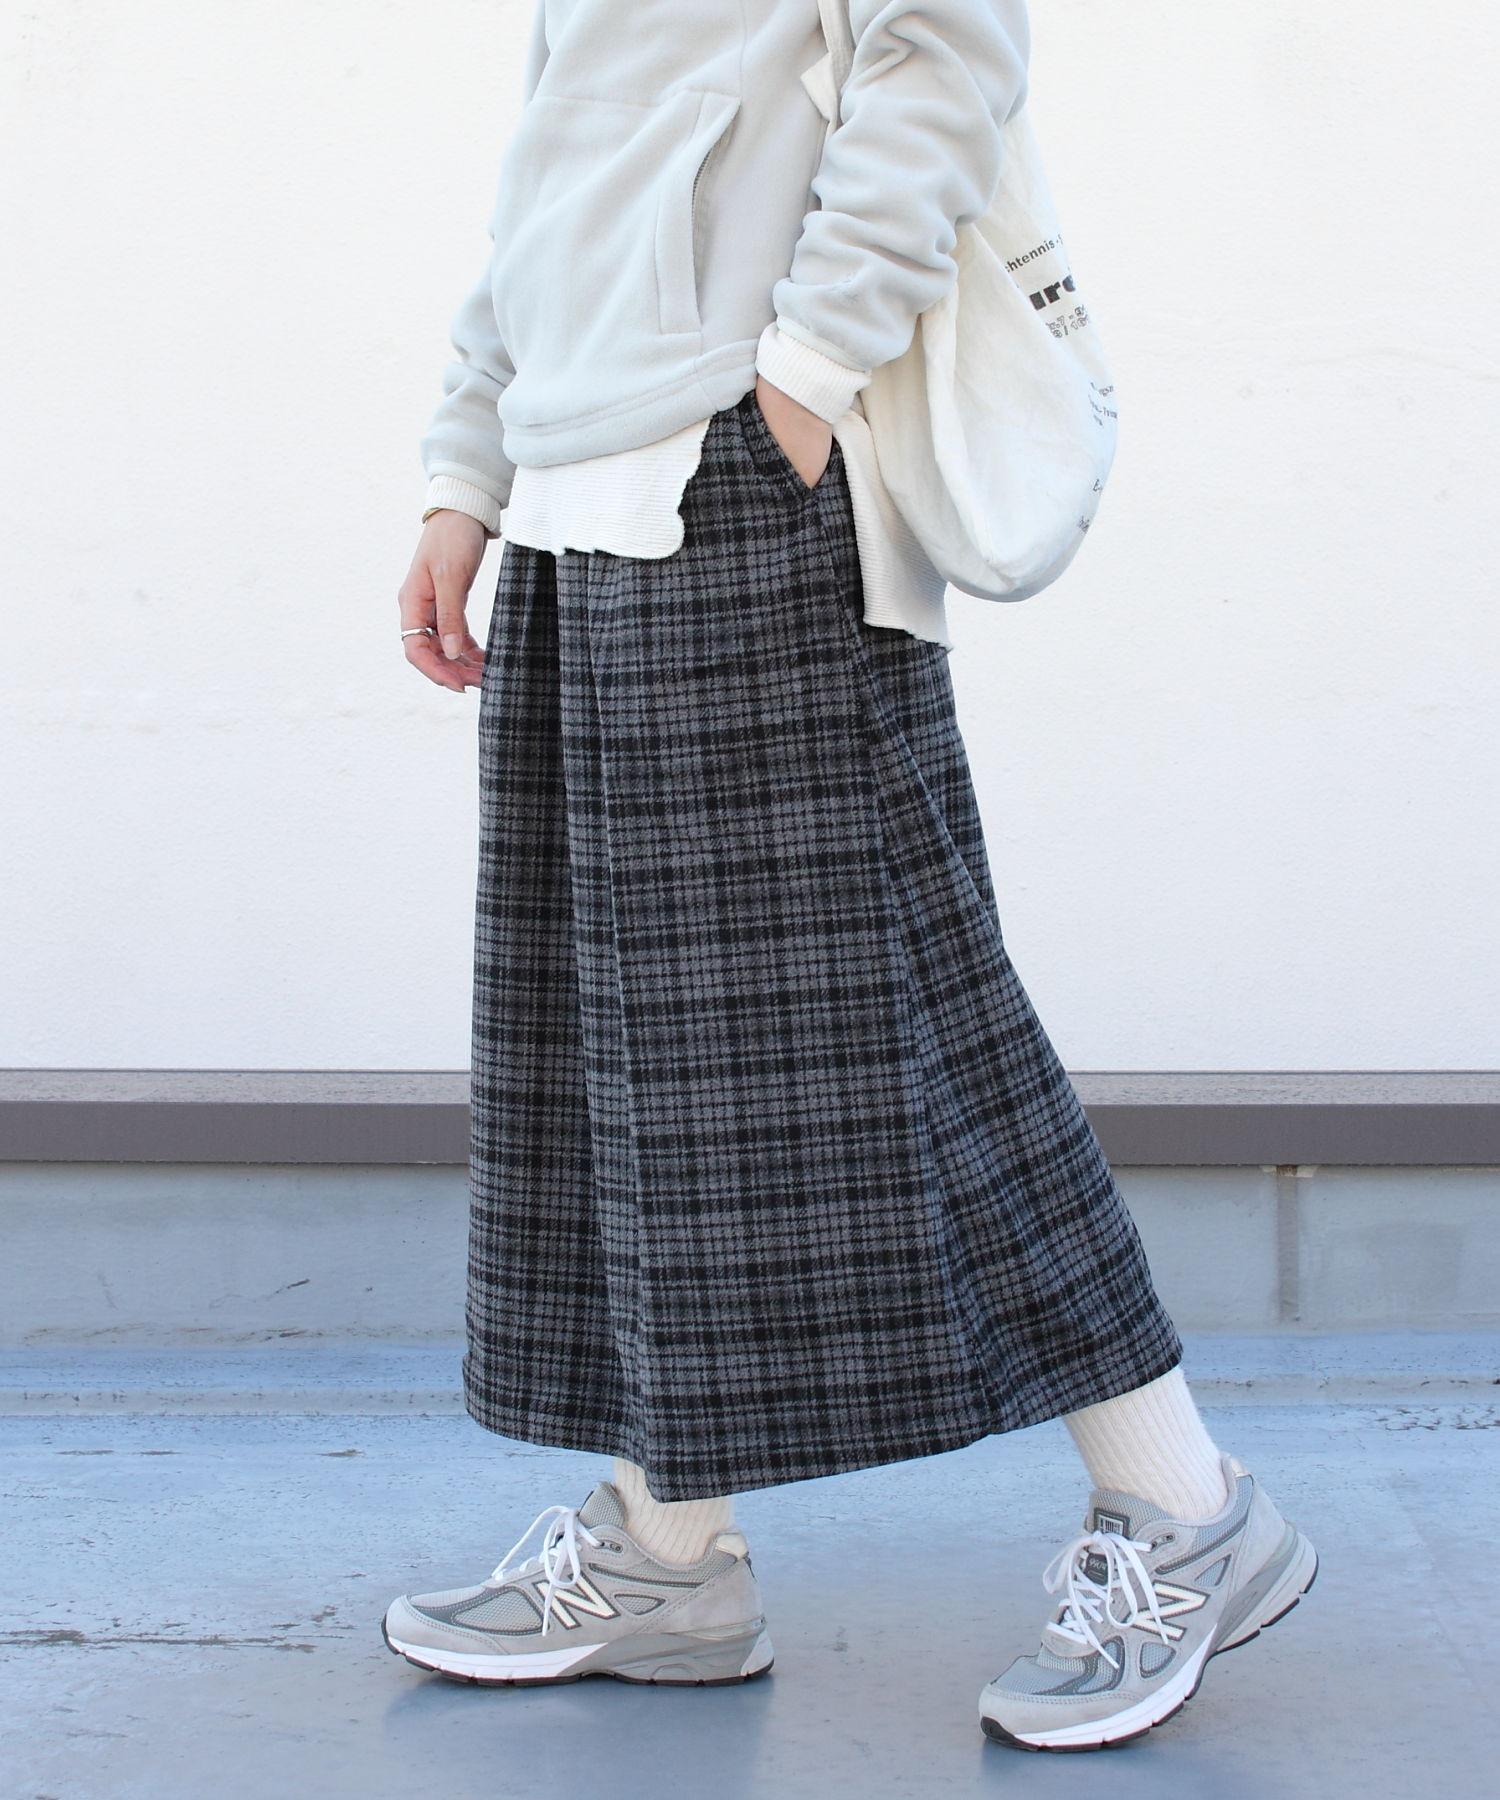 GRAMICCI/グラミチ ウールブレンド ロングフレアスカート WOOL BLEND LONG FLARE SKIRT GLSK-21F061